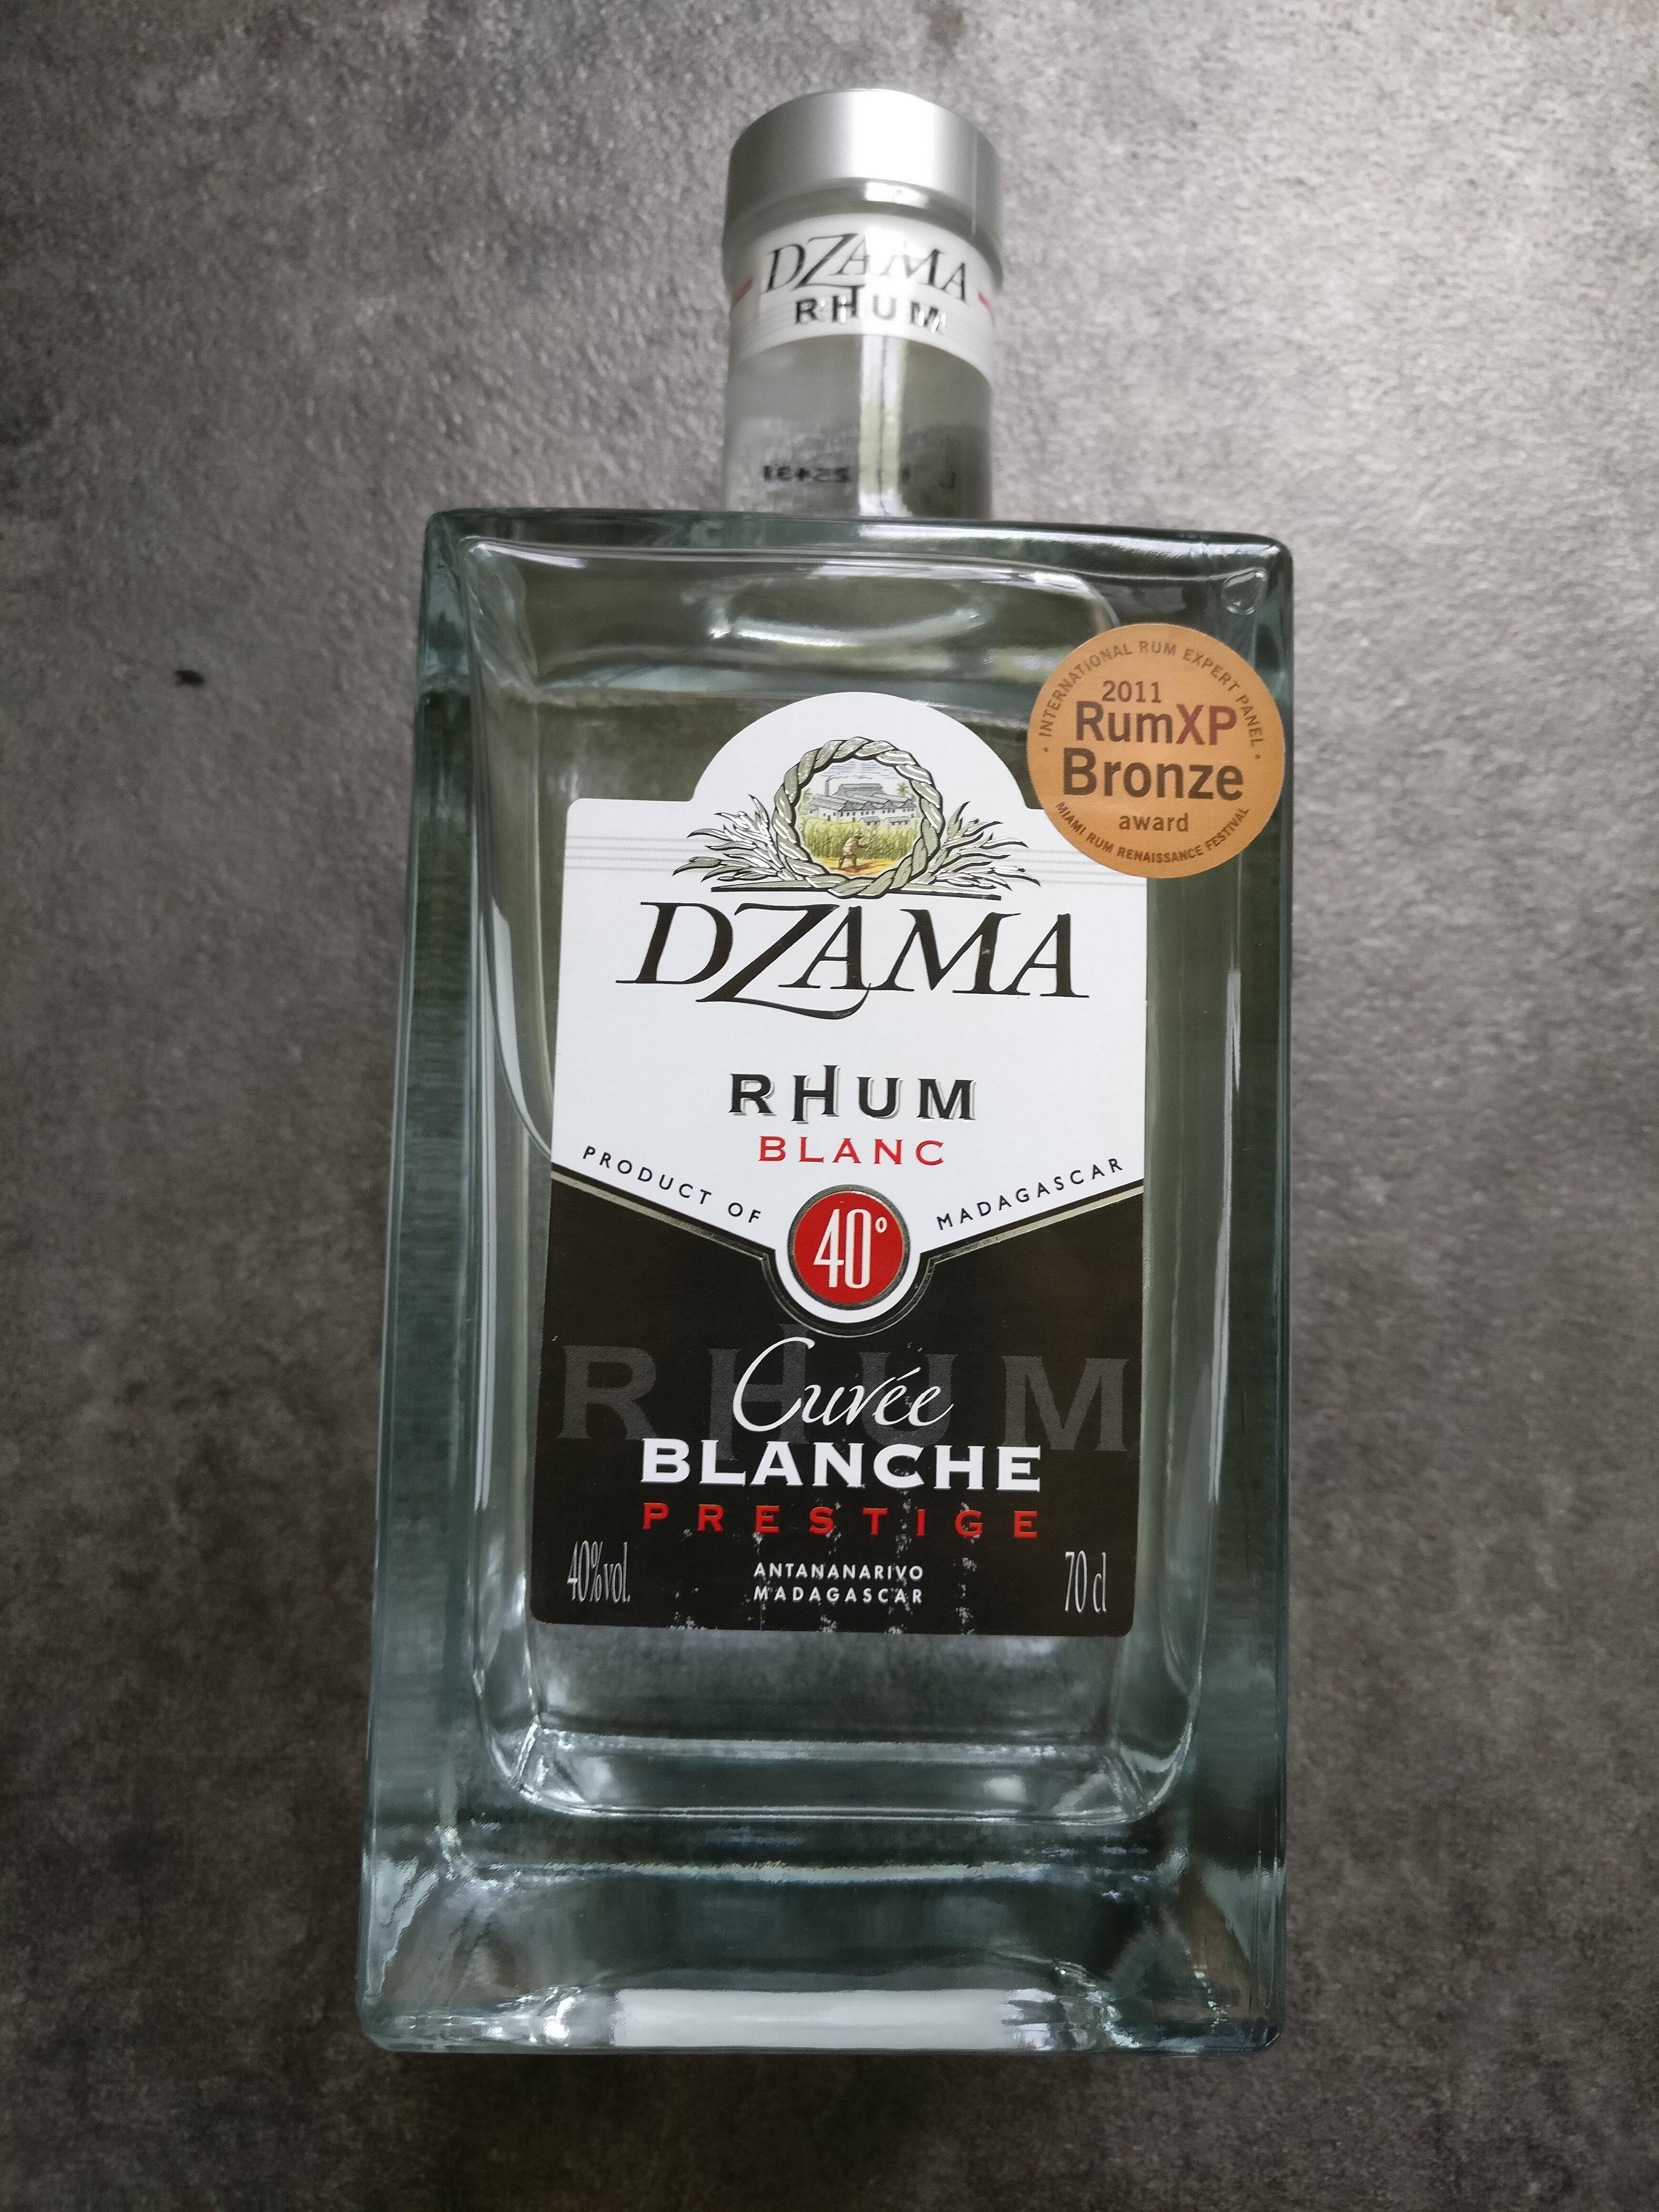 Dzama prestige cuvée blanche - Produit - fr